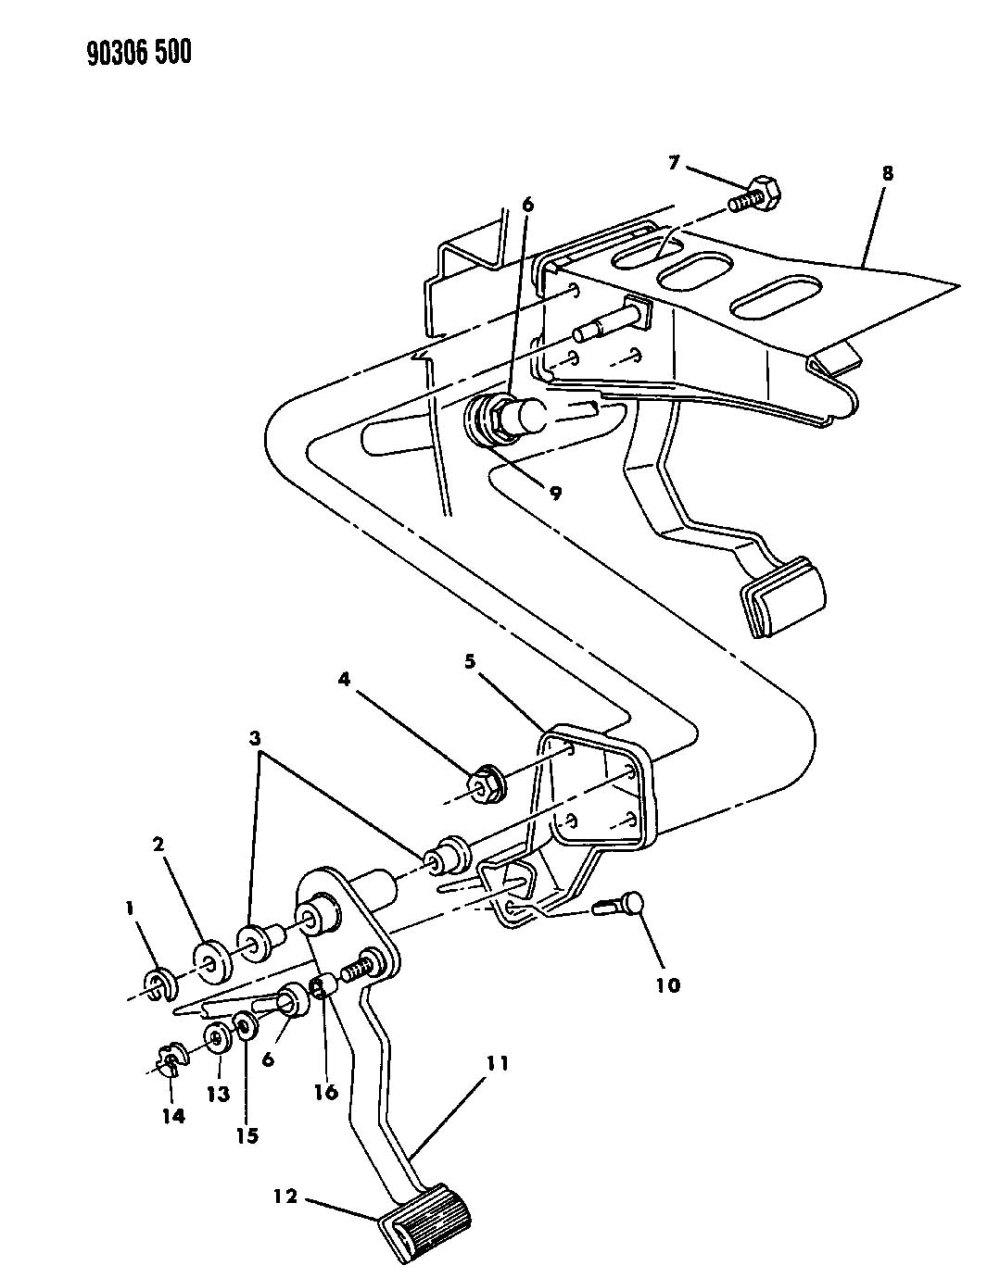 medium resolution of 95 suzuki sidekick vacuum diagram suzuki auto wiring diagram 96 nissan pathfinder stereo wiring colors 96